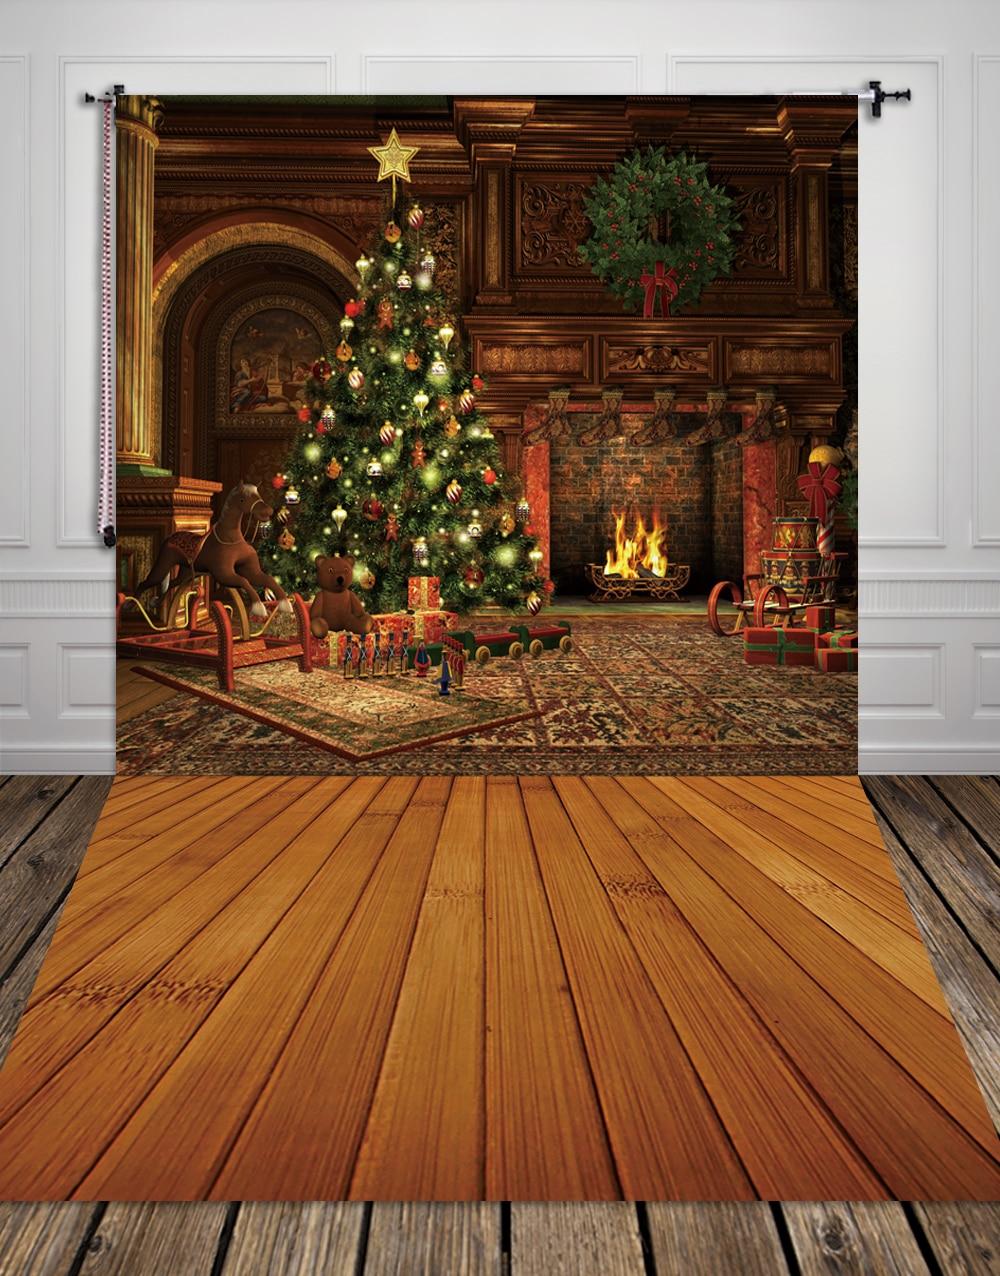 HUAYI Fireplace Christmas tree Photography Photo Backdrop xt2294<br><br>Aliexpress